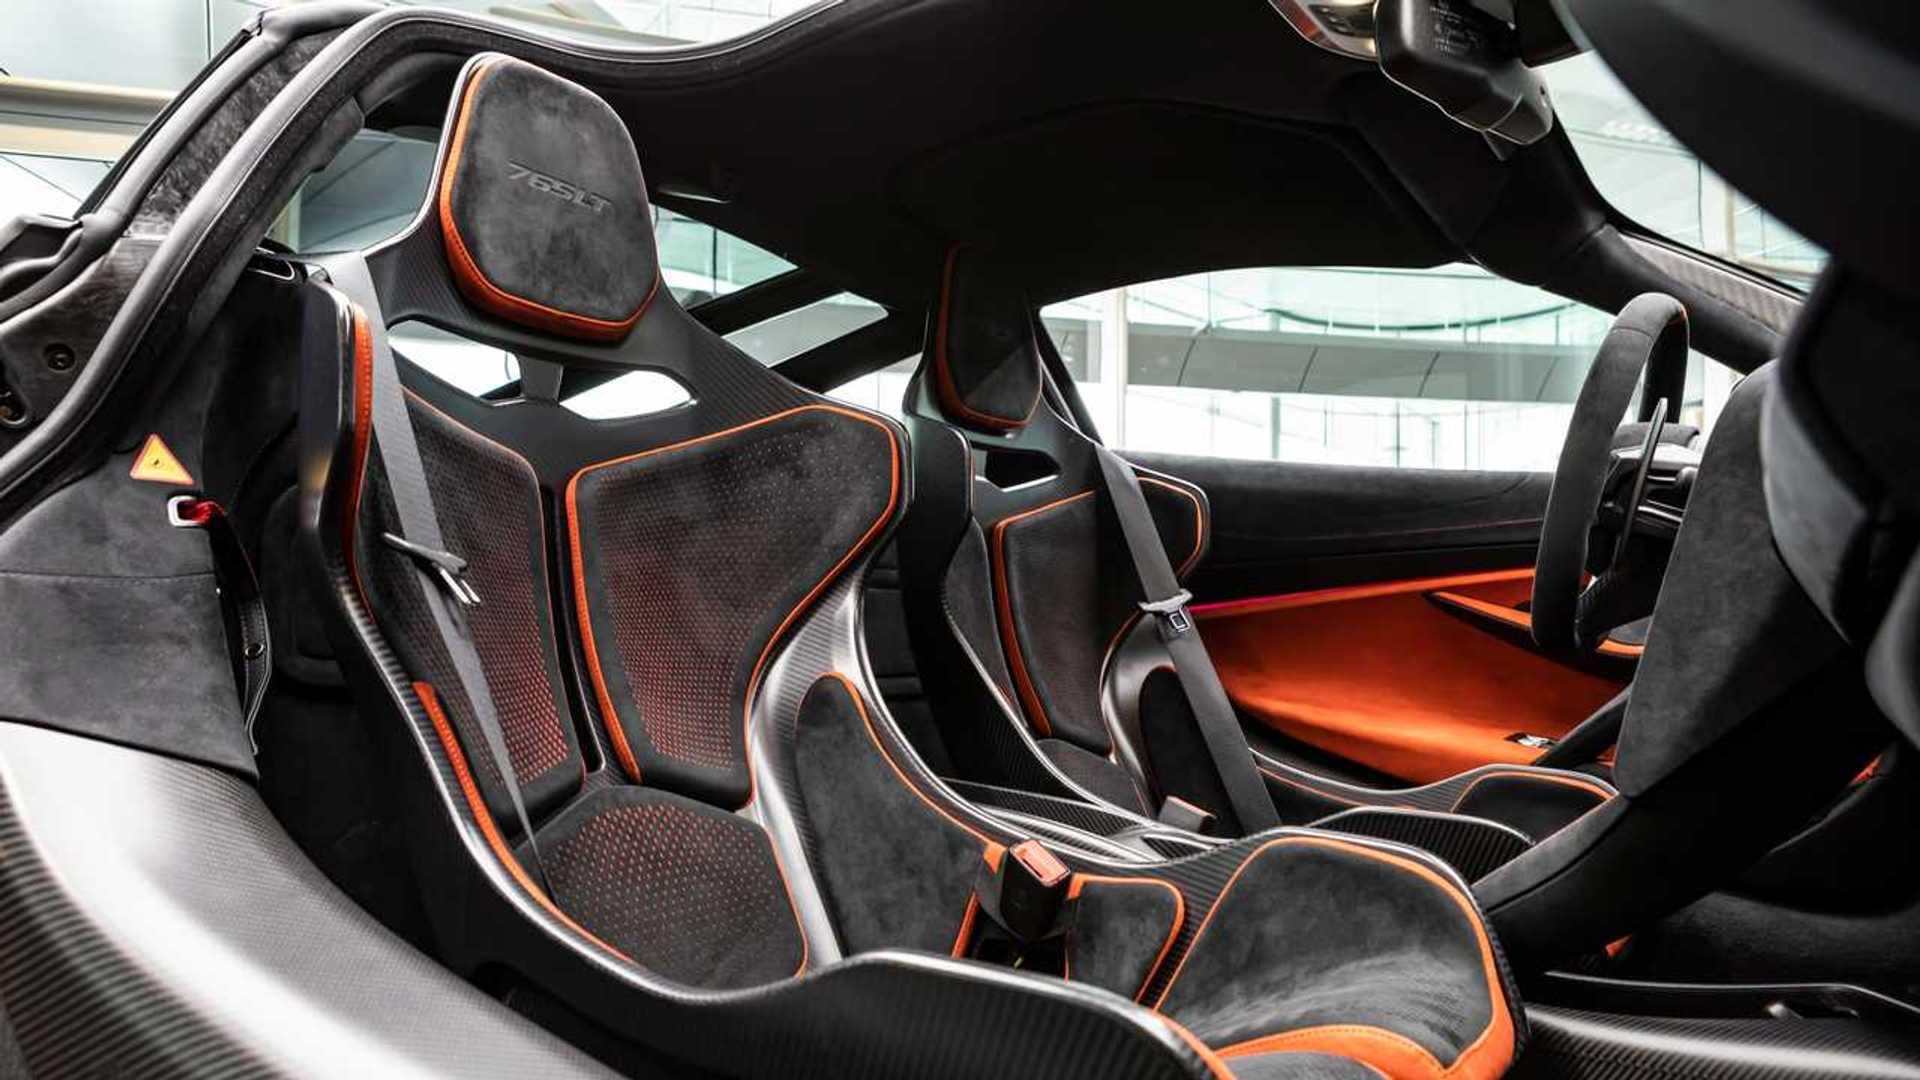 McLaren 765LT interior